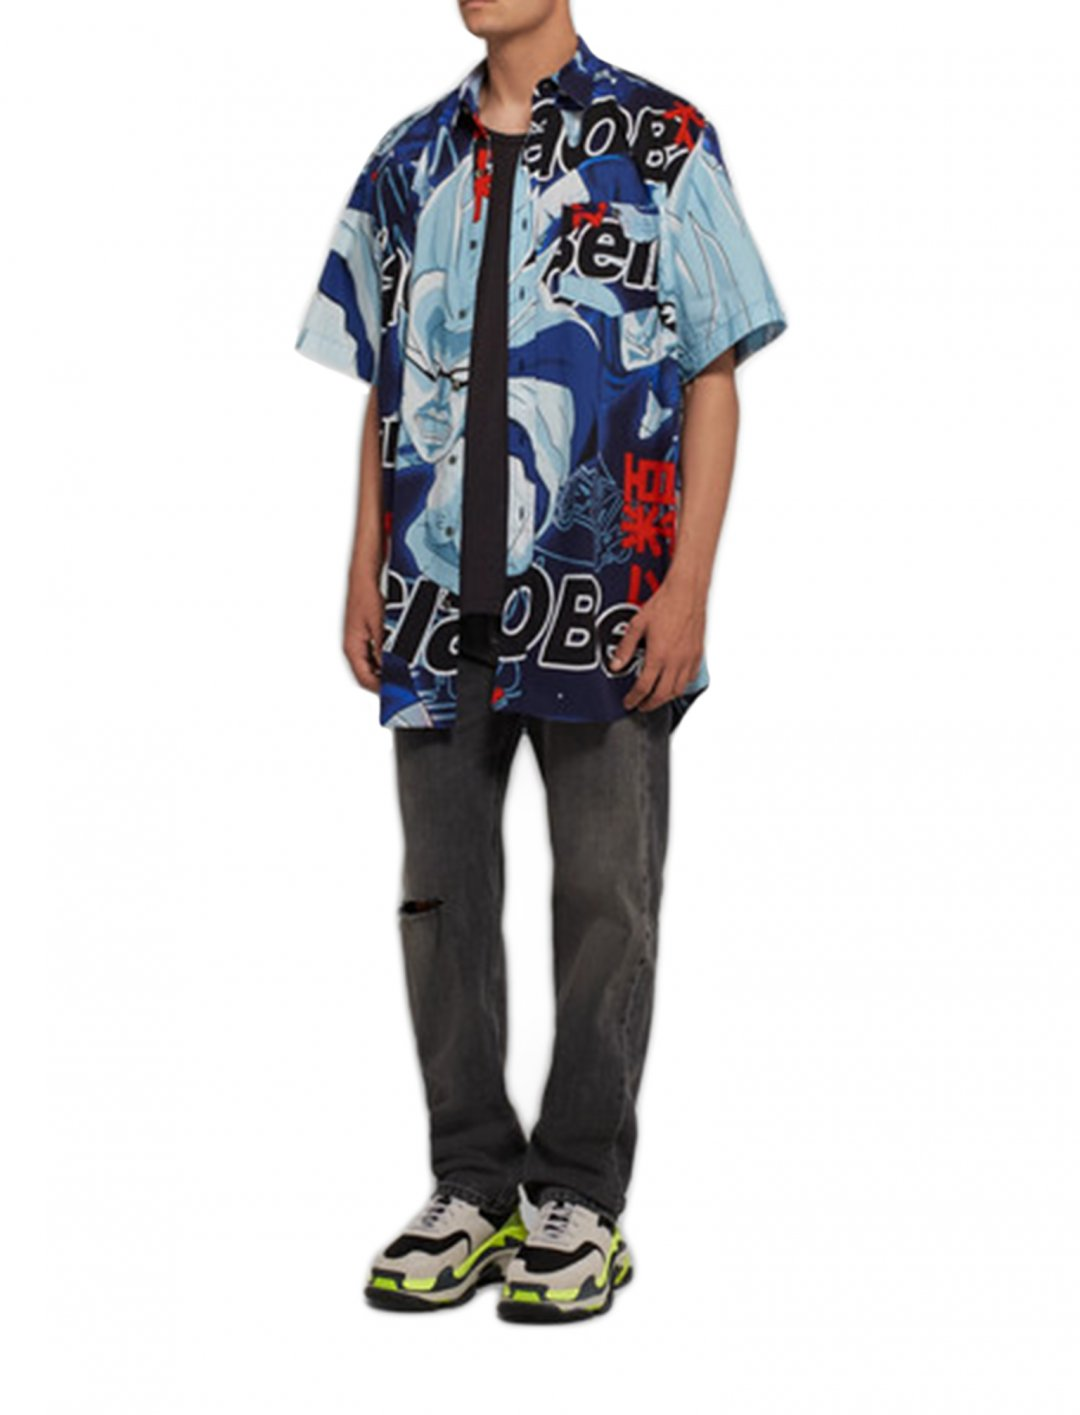 Jax Jones' Shirt Clothing Vetements